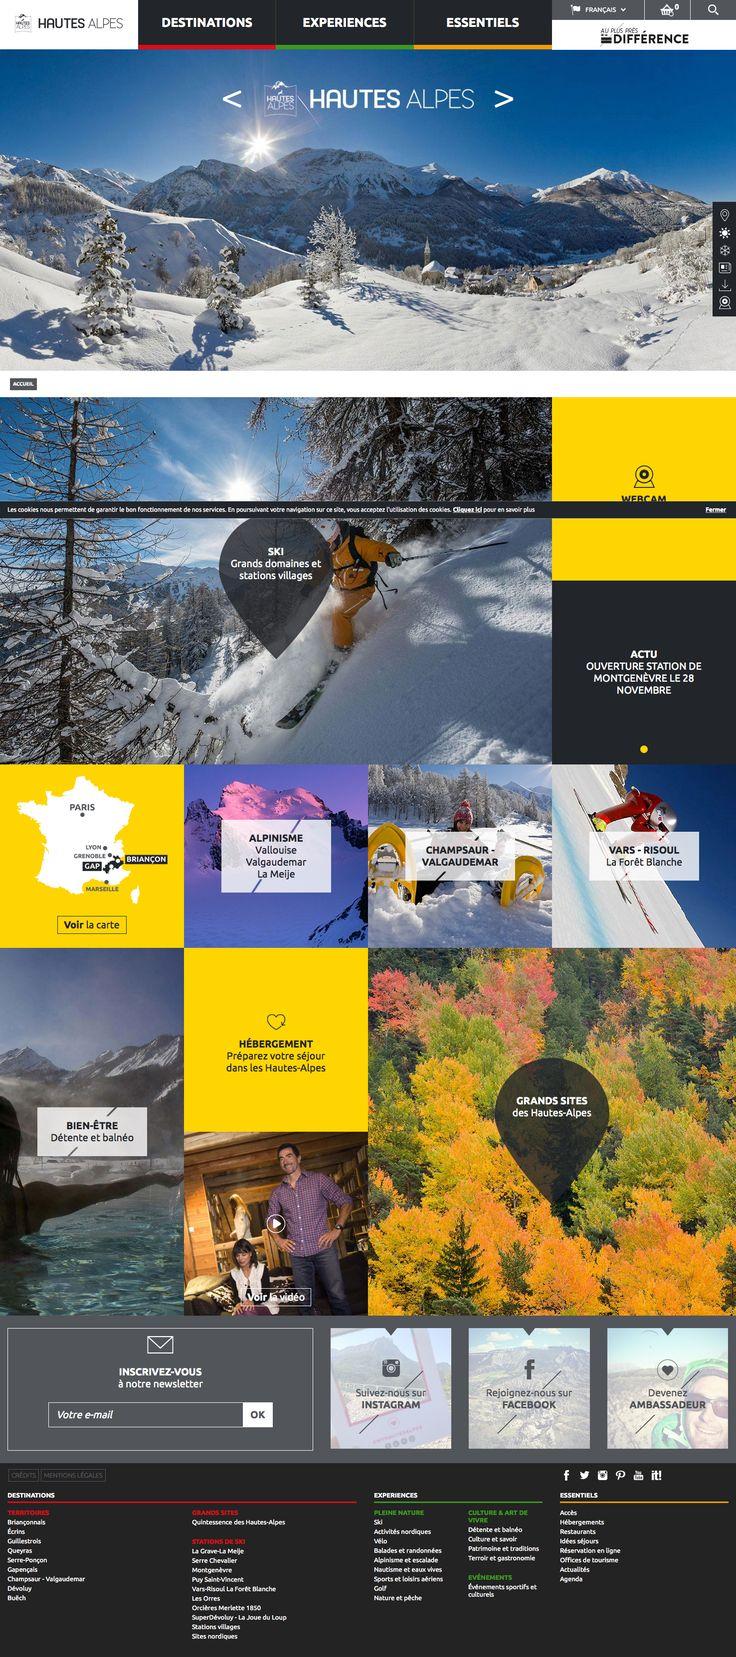 http://www.hautes-alpes.net/fr/tourisme.html